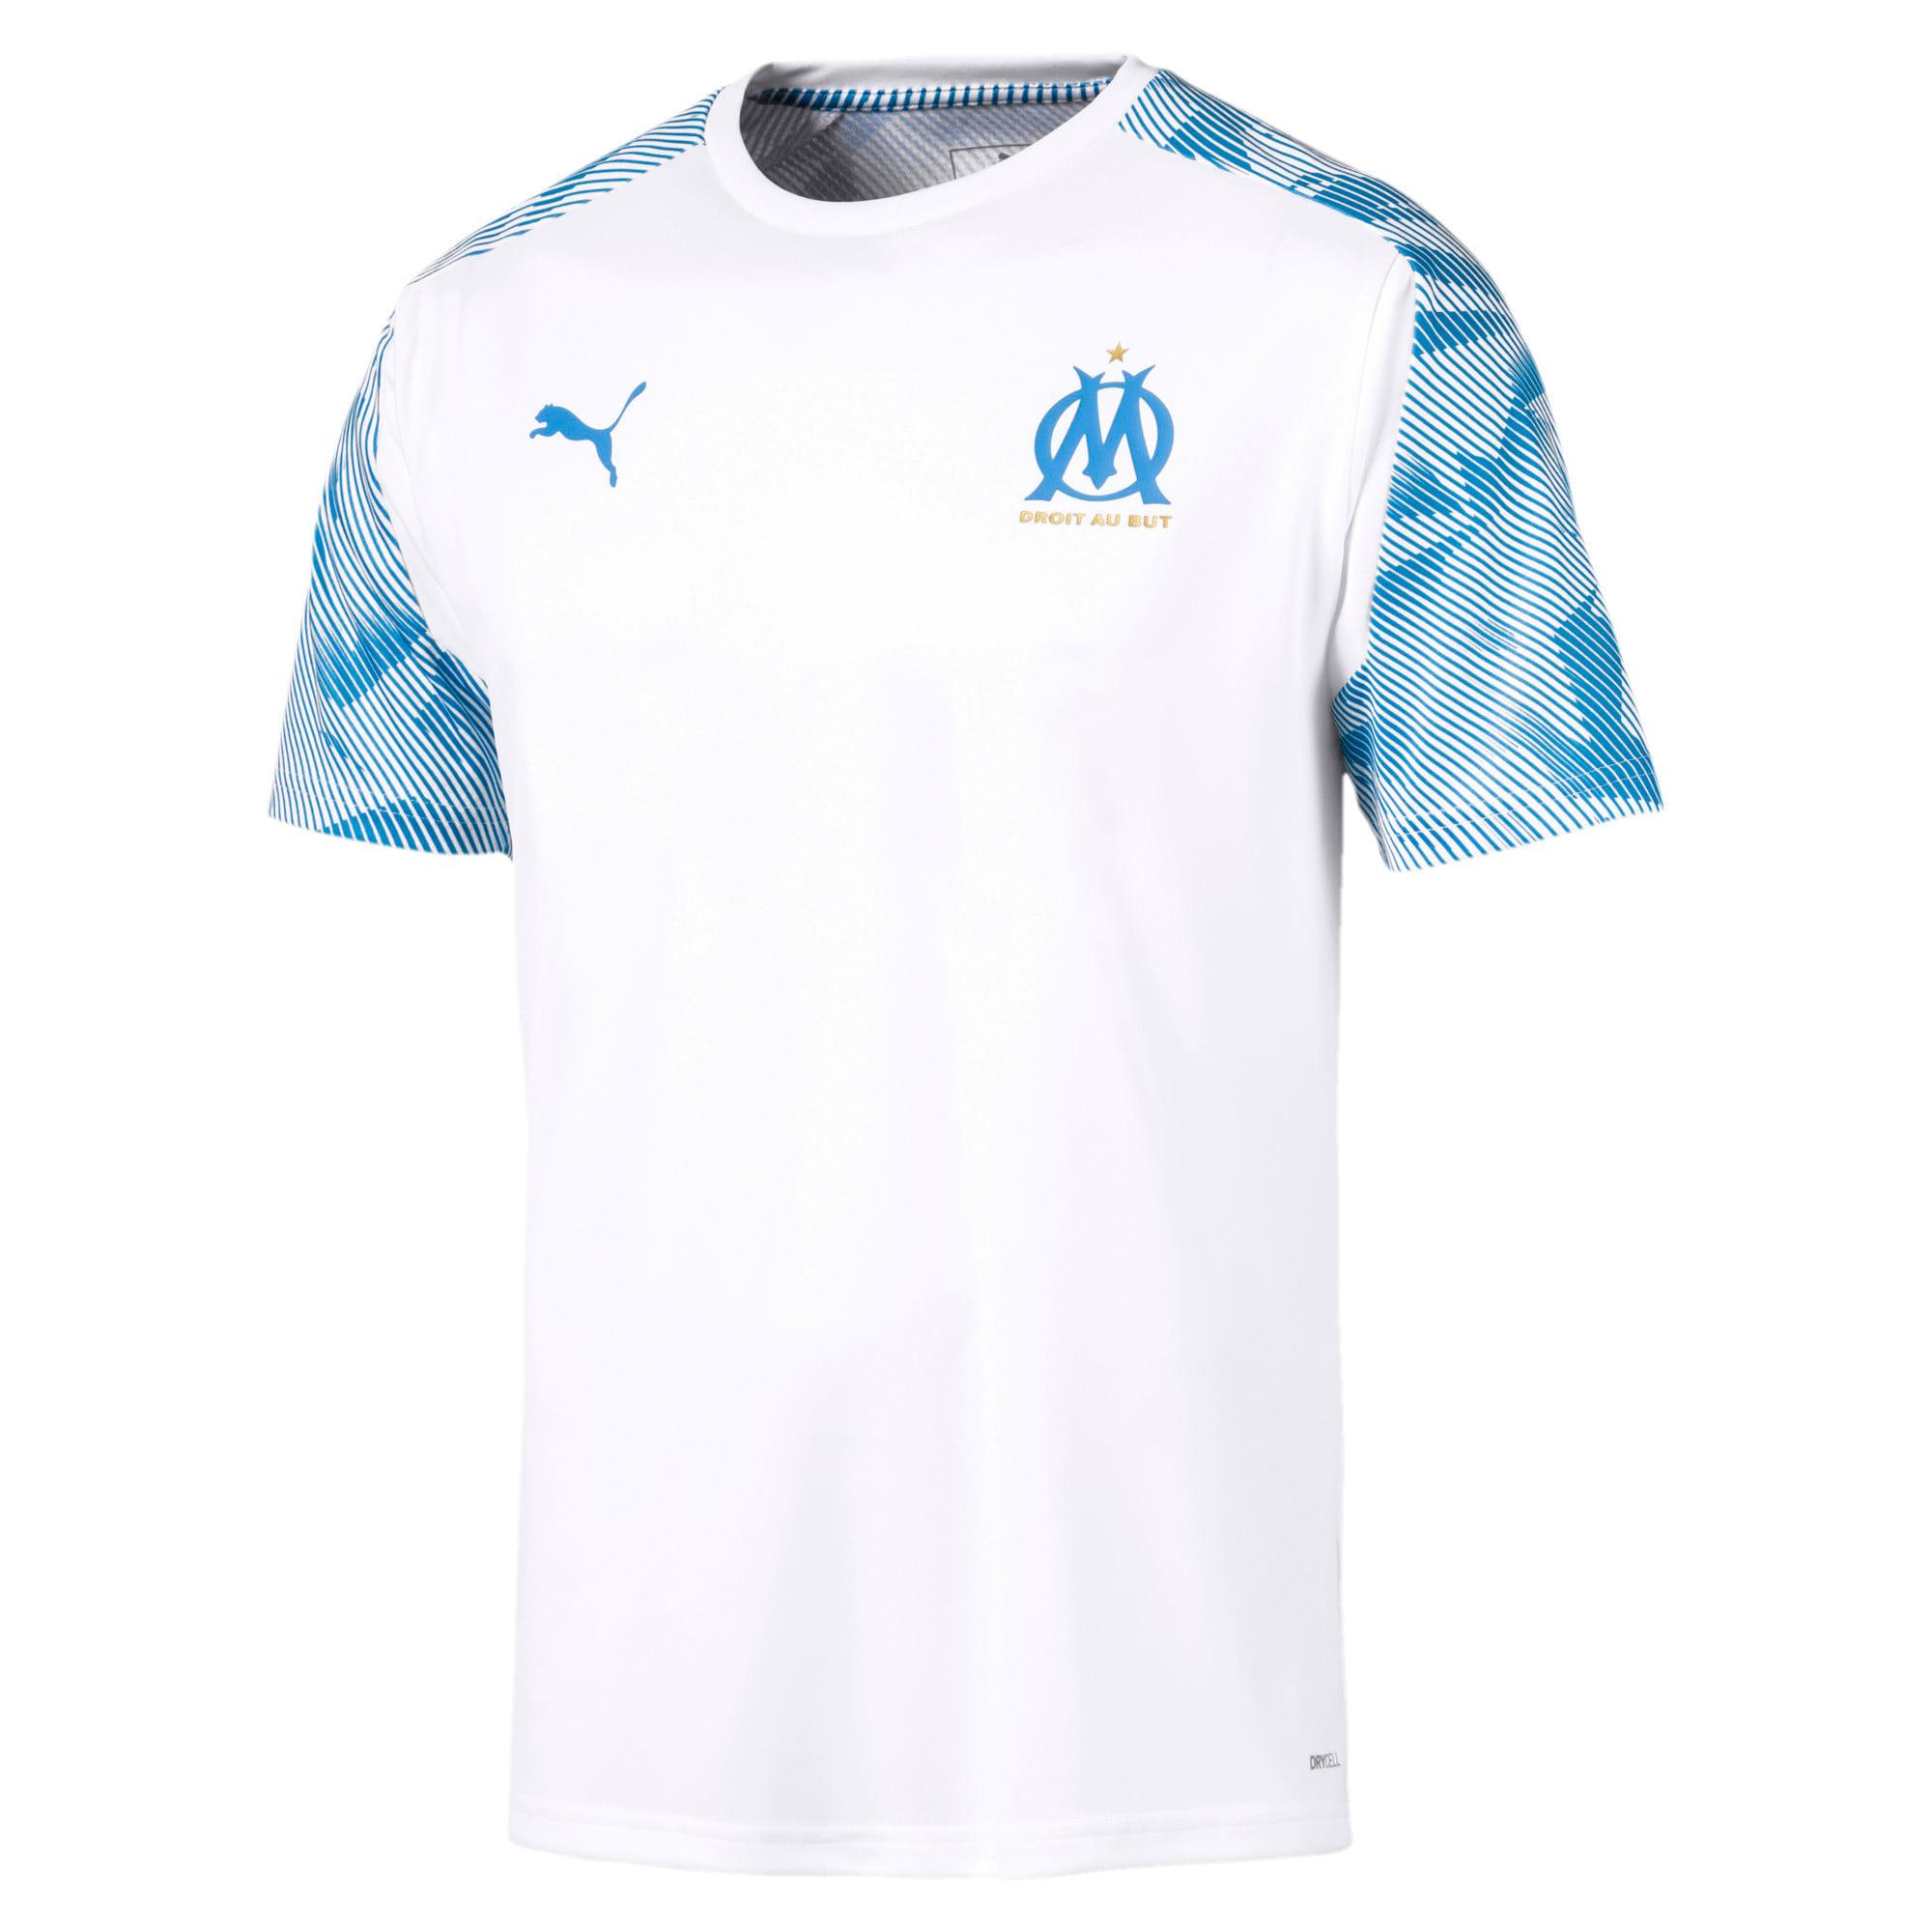 Thumbnail 4 of Olympique de Marseille Short Sleeve Training Jersey, Puma White-Bleu Azur, medium